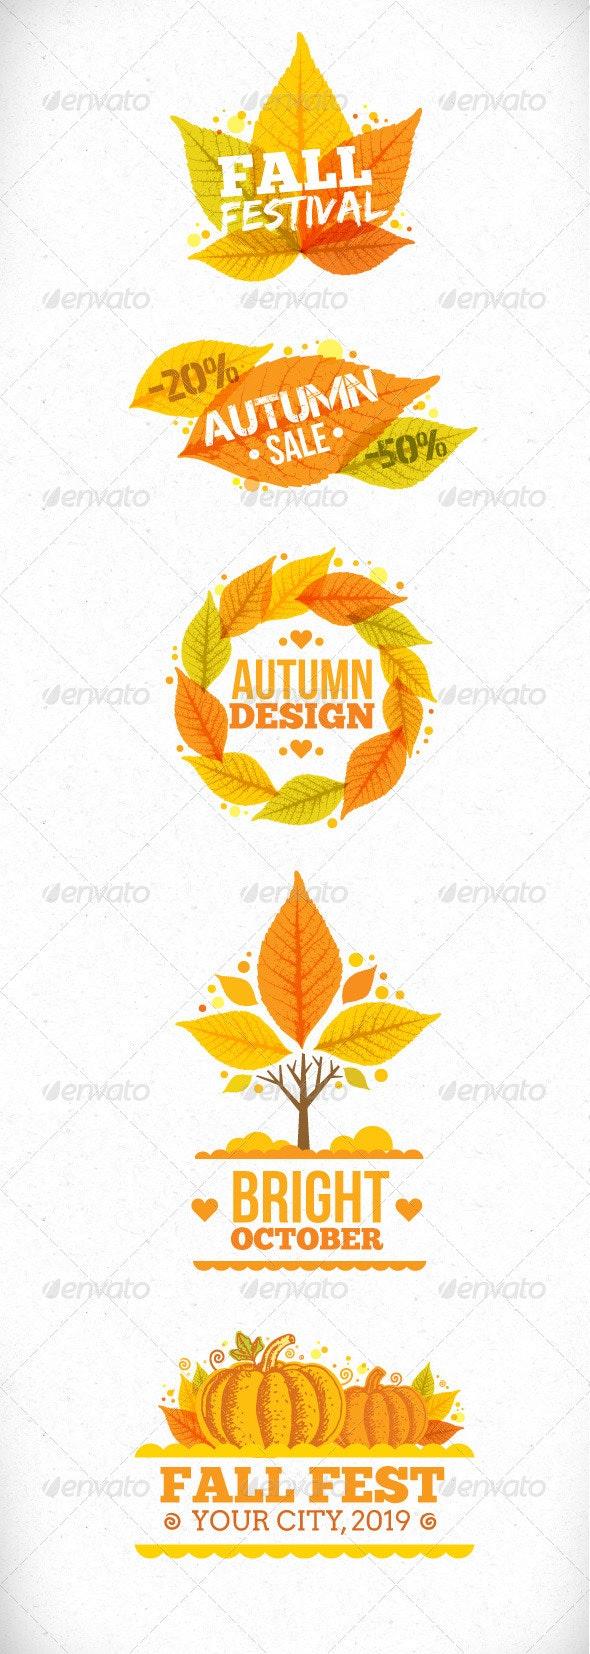 Autumn Leaves Vector Art Design Elements - Seasons Nature